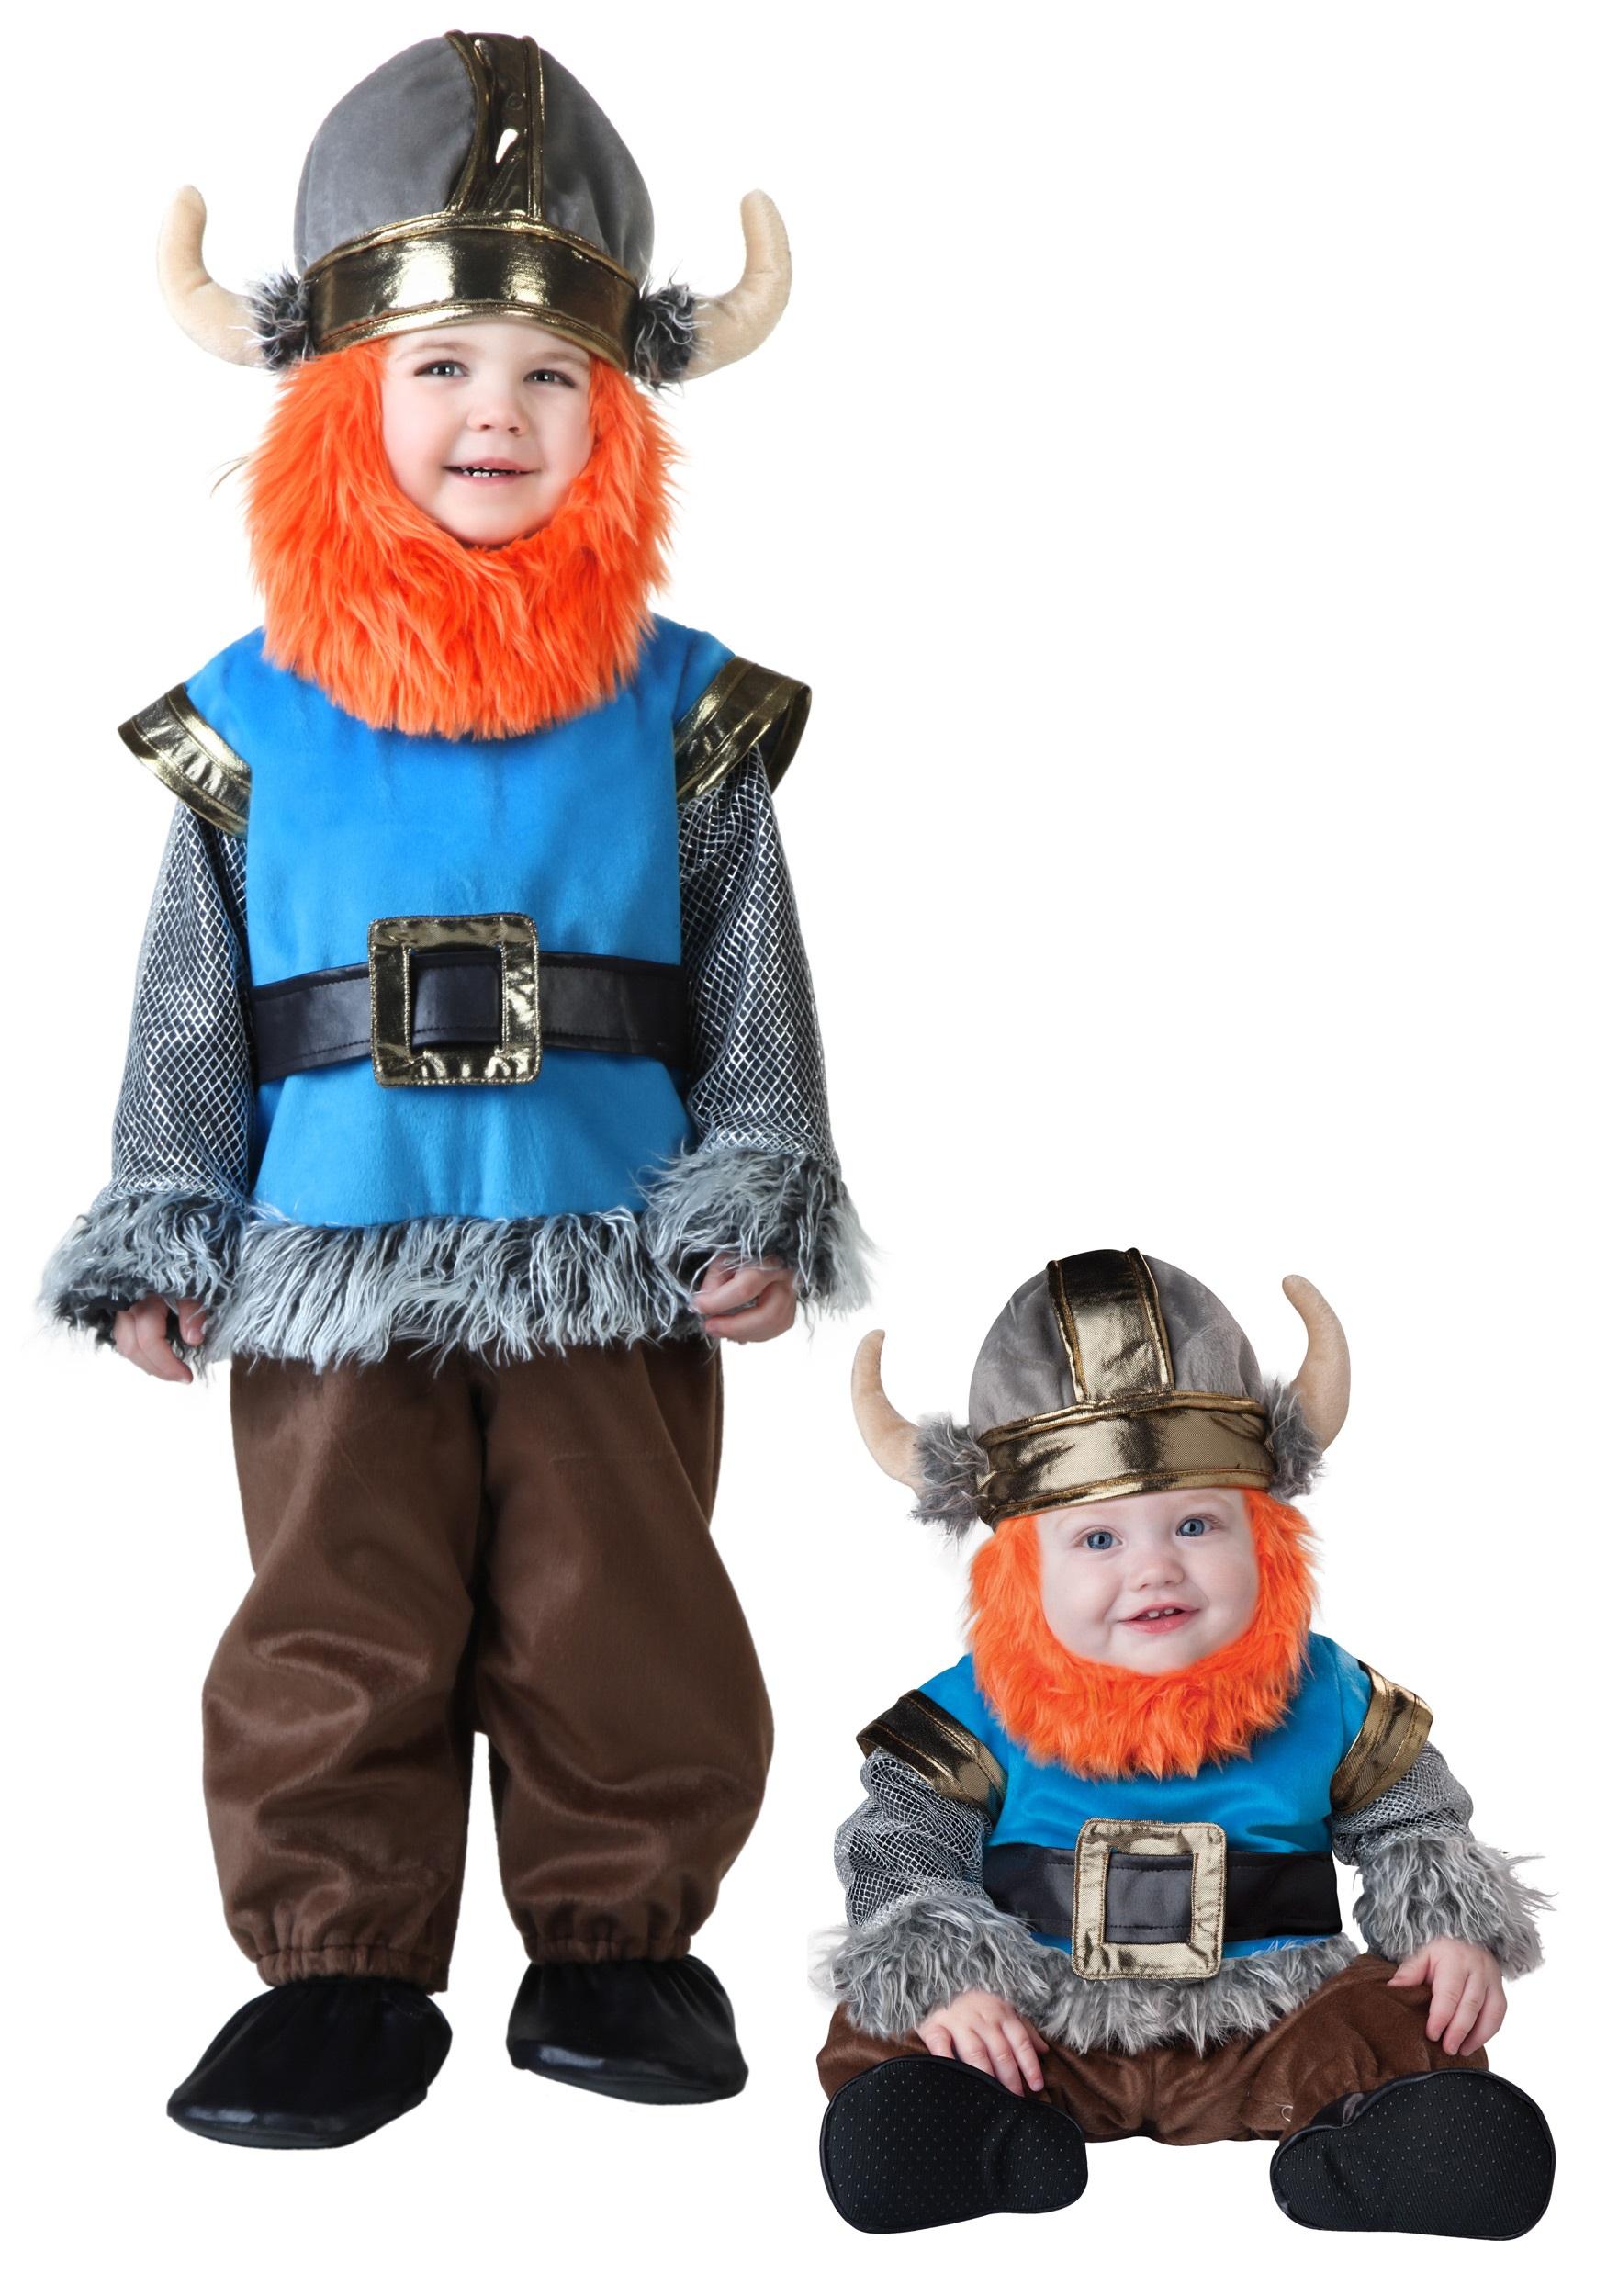 Liu0027l Viking Costume  sc 1 st  Halloween Costumes & Liu0027l Viking Costume - Halloween Costumes